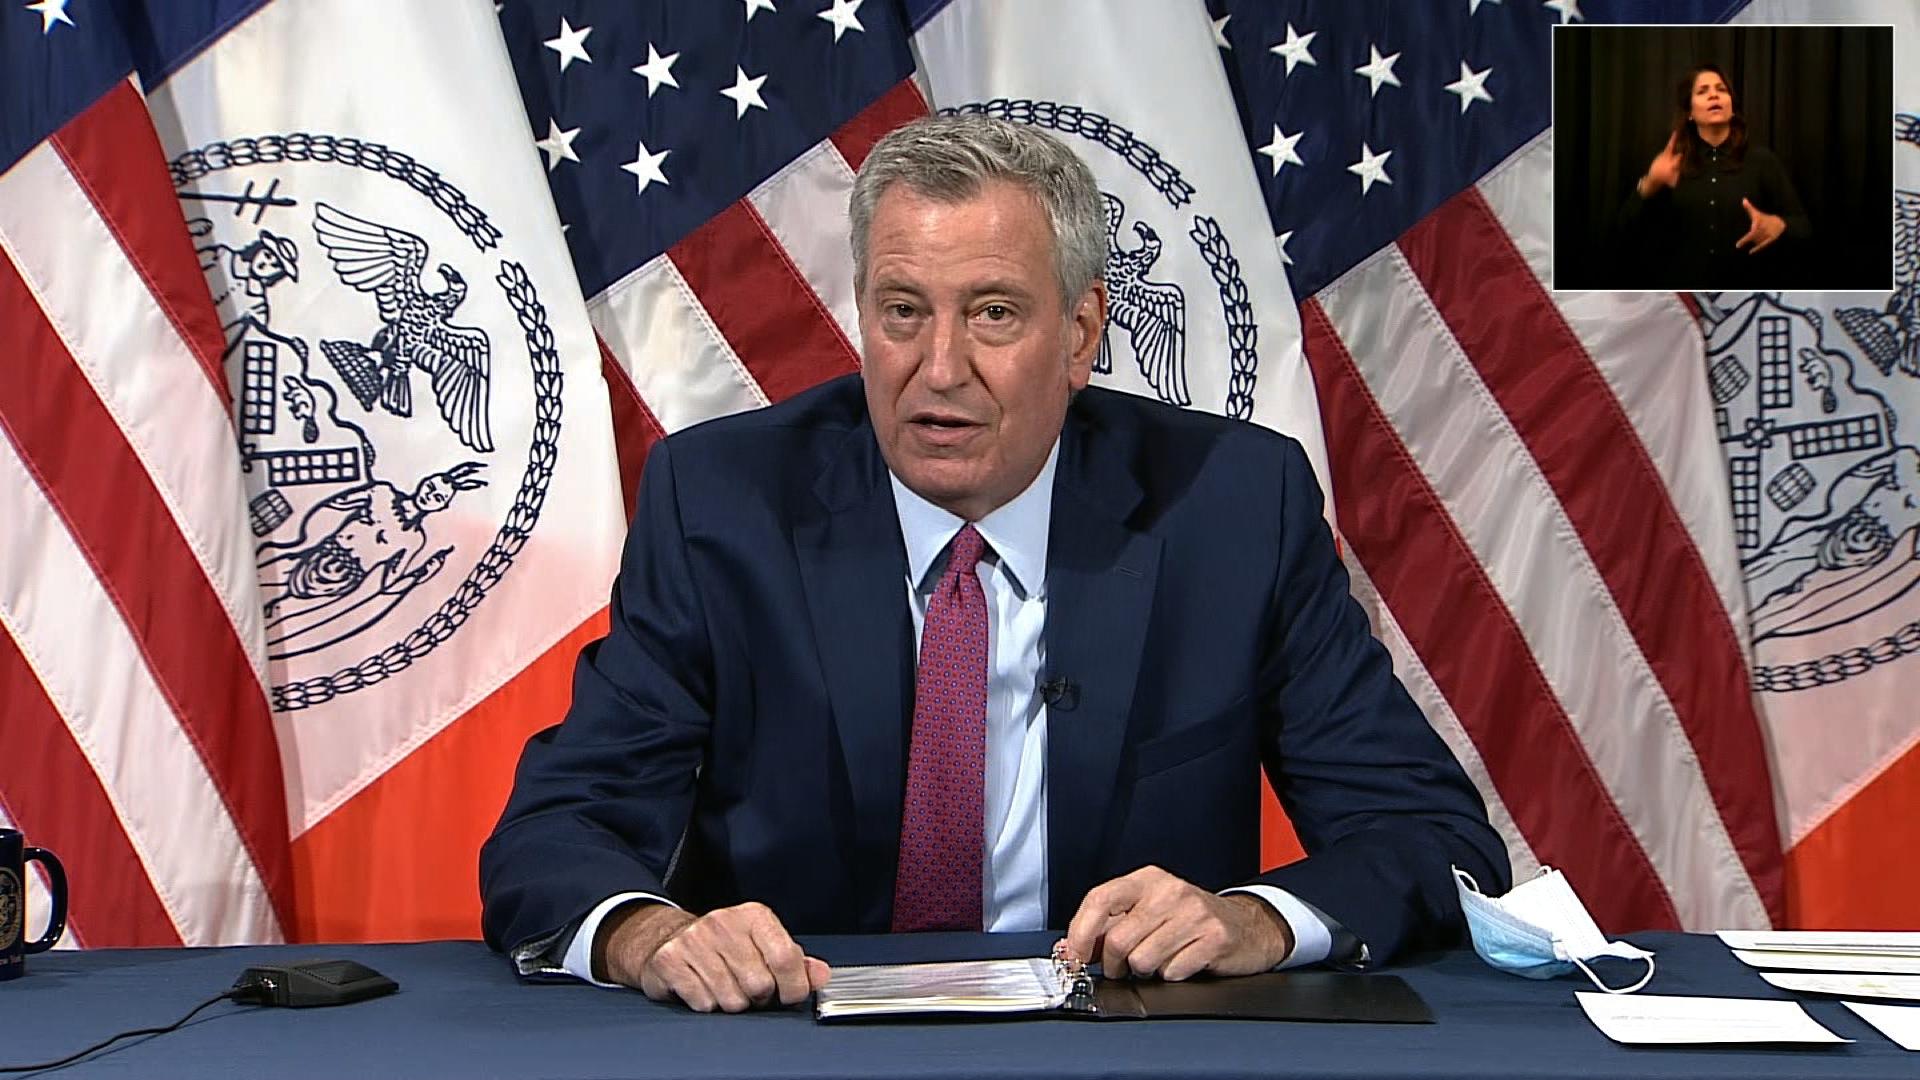 Mayor Bill de Blasio speaks at a press conference in New York on November 9.